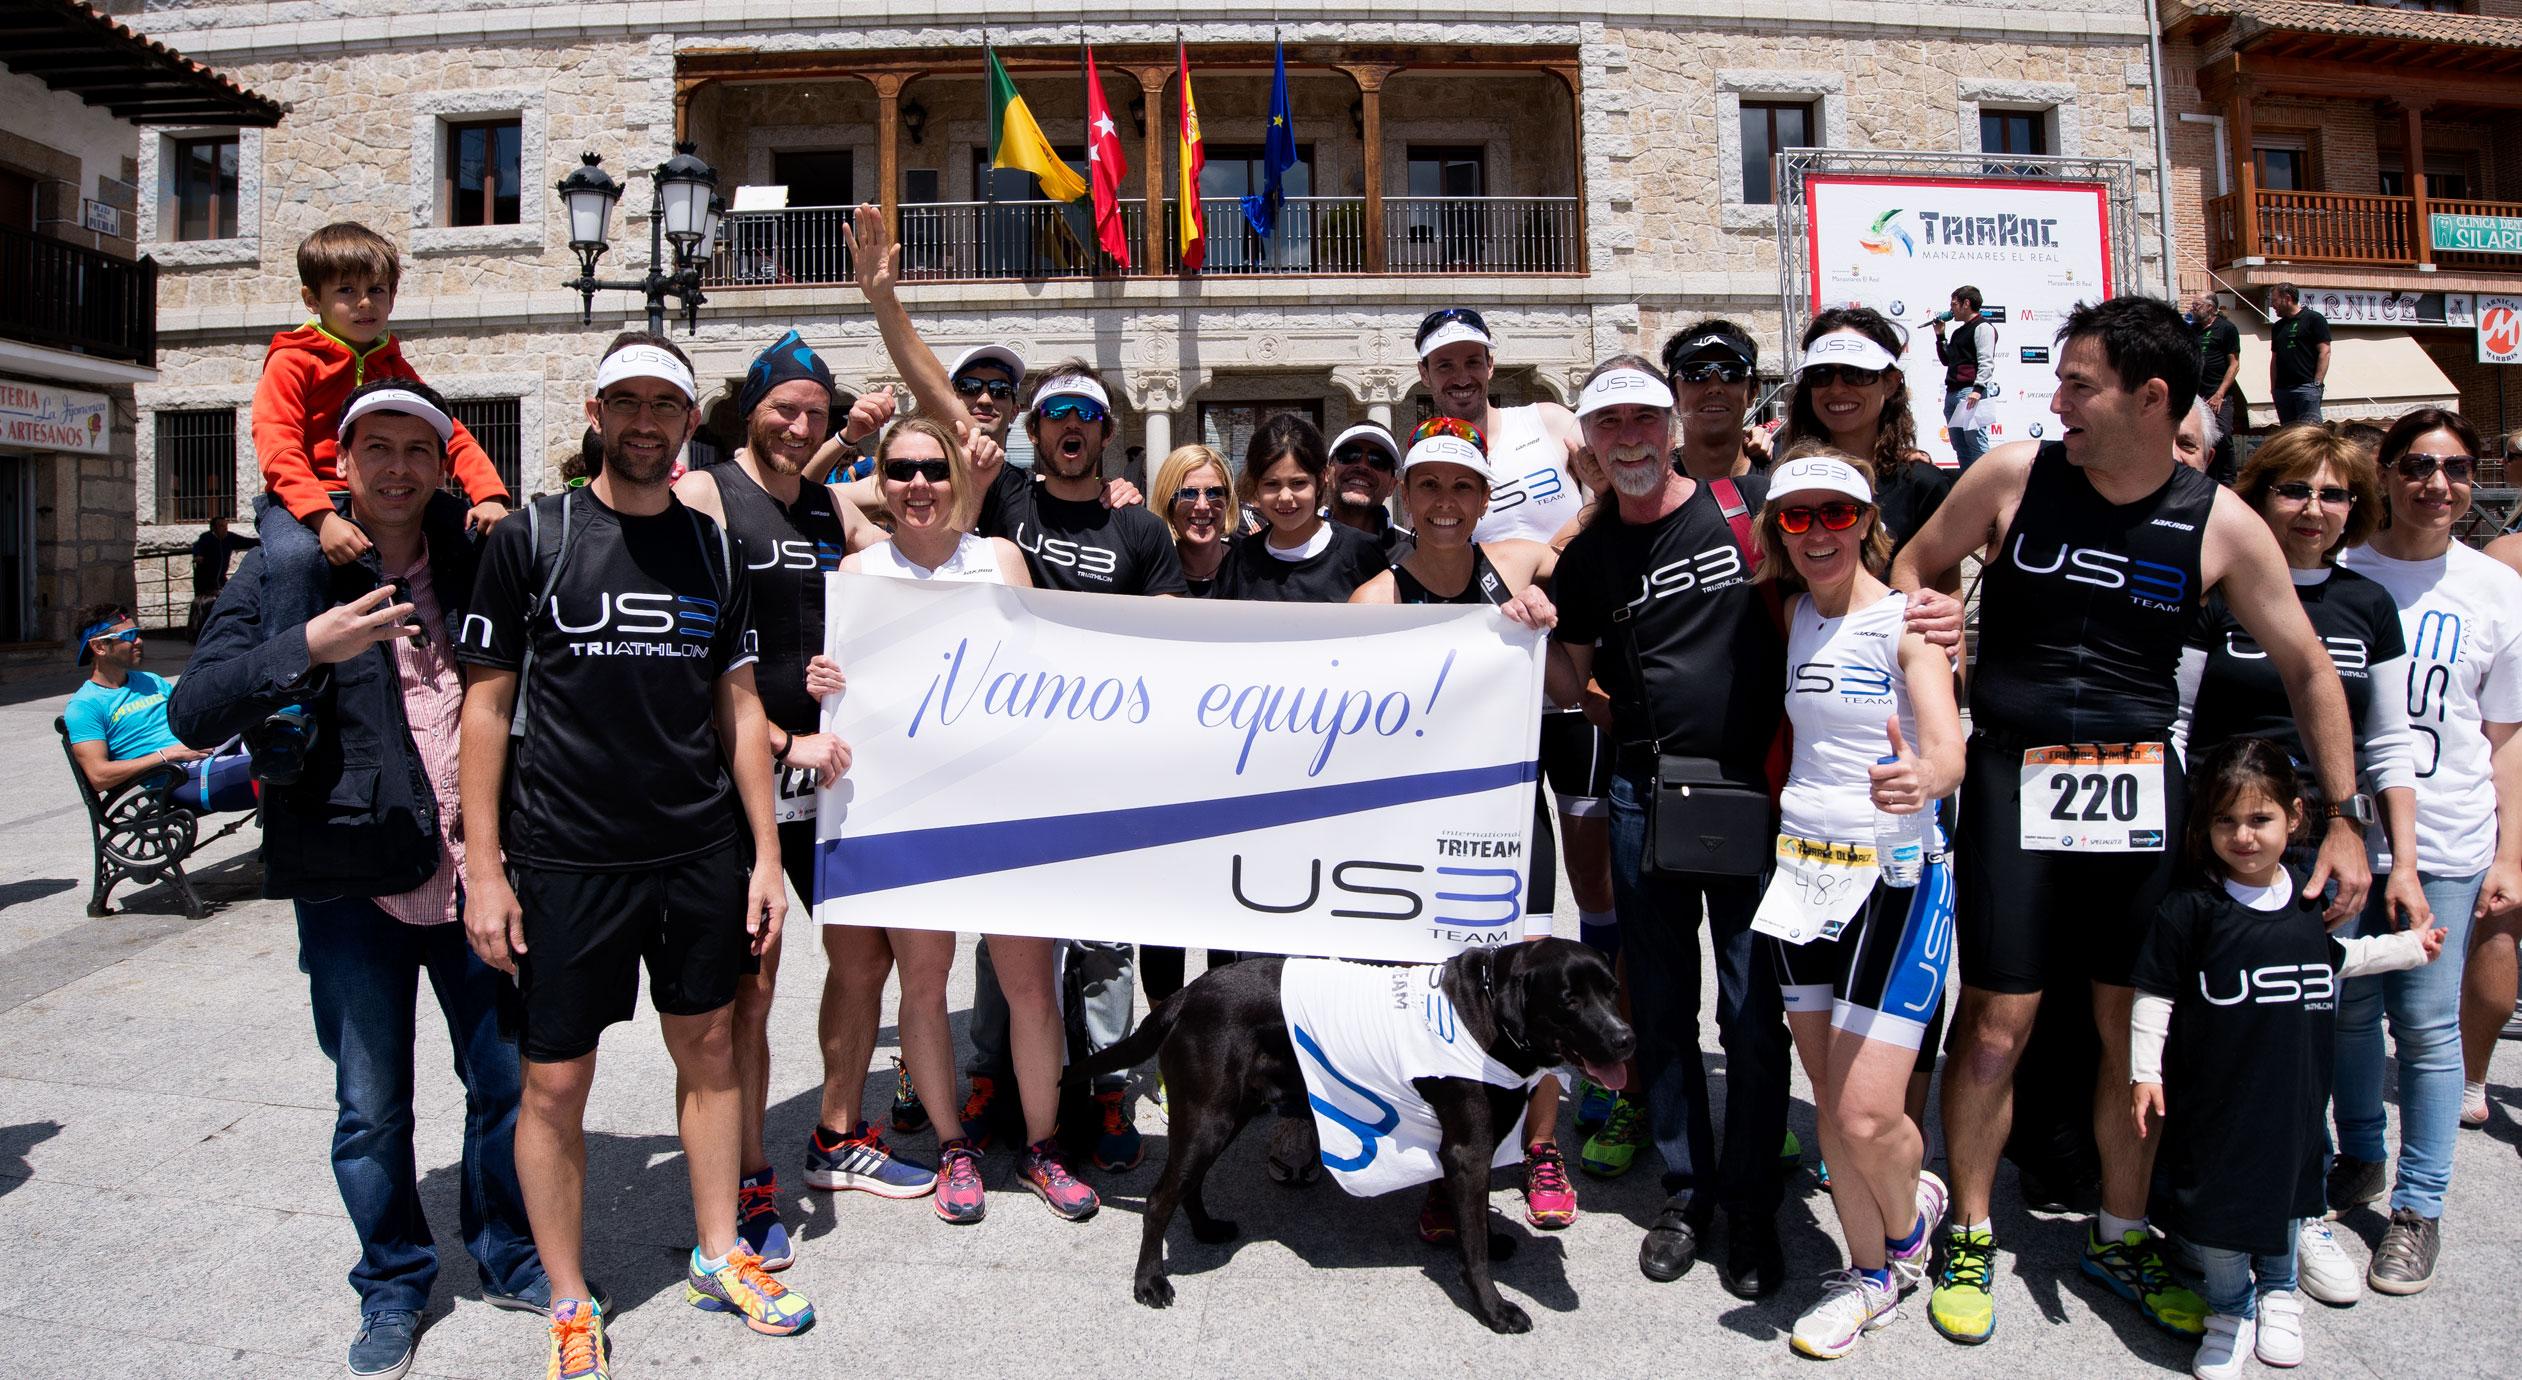 us3-triathlon-team-triaroc-team